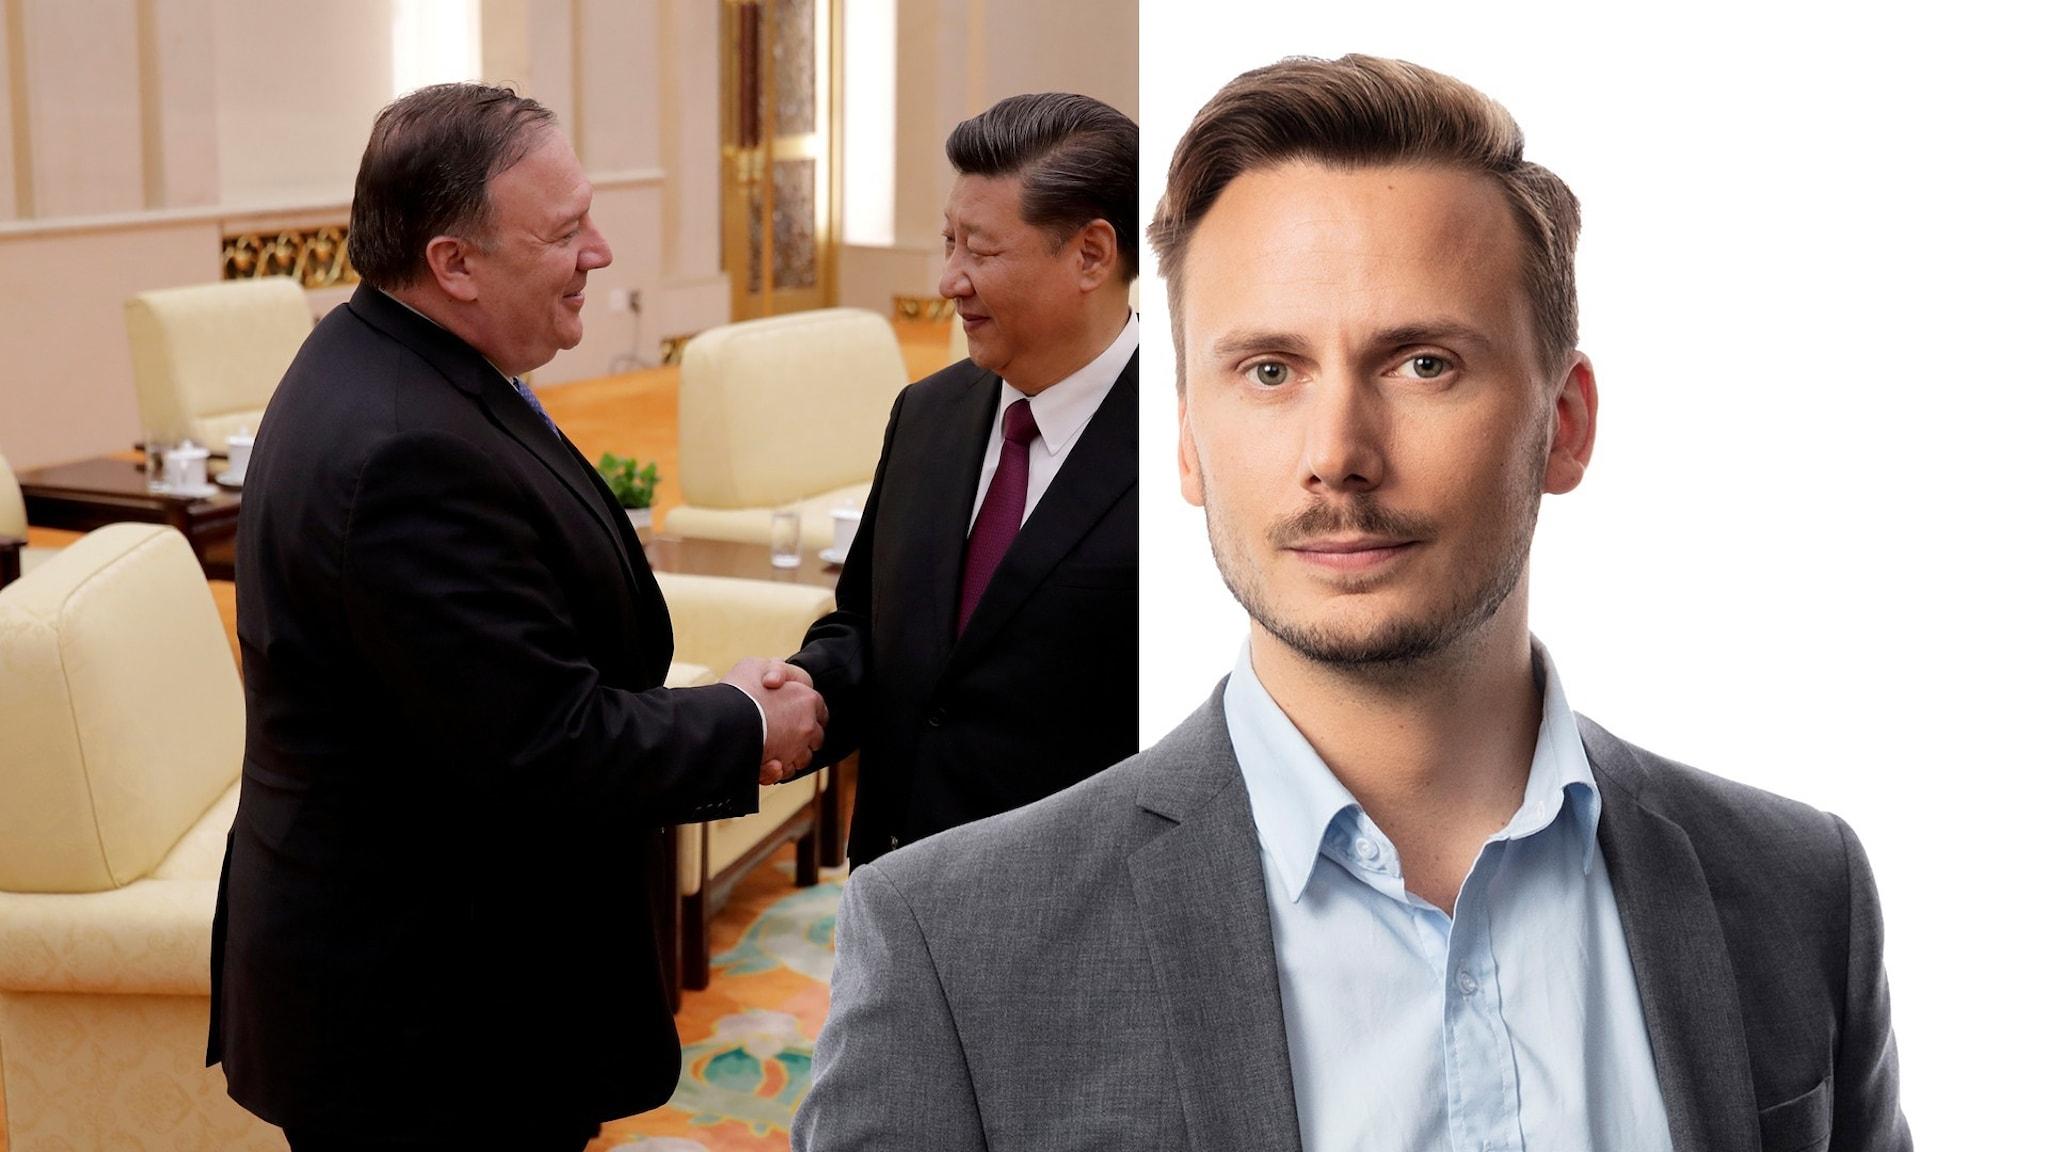 USA:s utrikesminister Mike Pompeo och Kinas president Xi Jinping